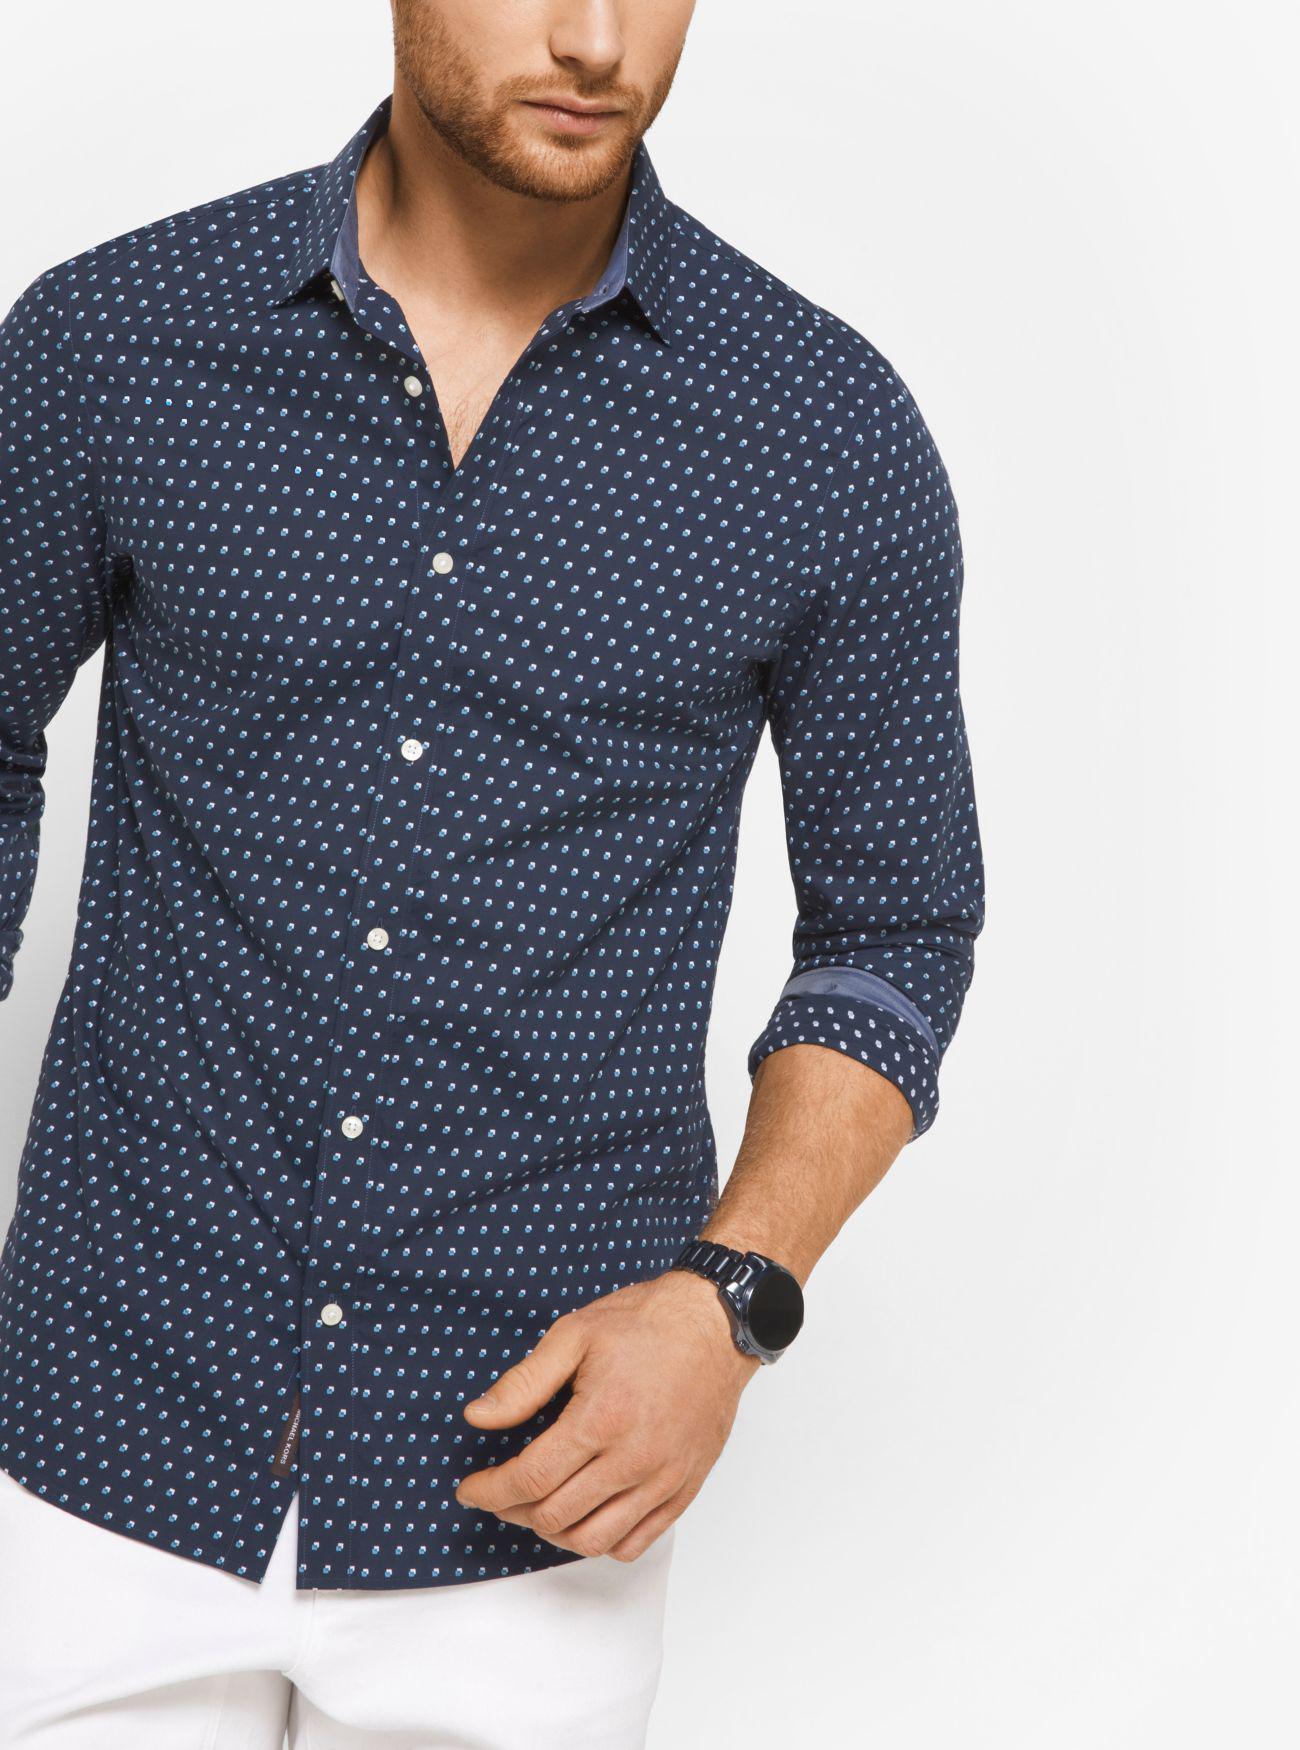 c4edc0273871 Lyst - Michael Kors Slim-fit Cotton Shirt in Blue for Men